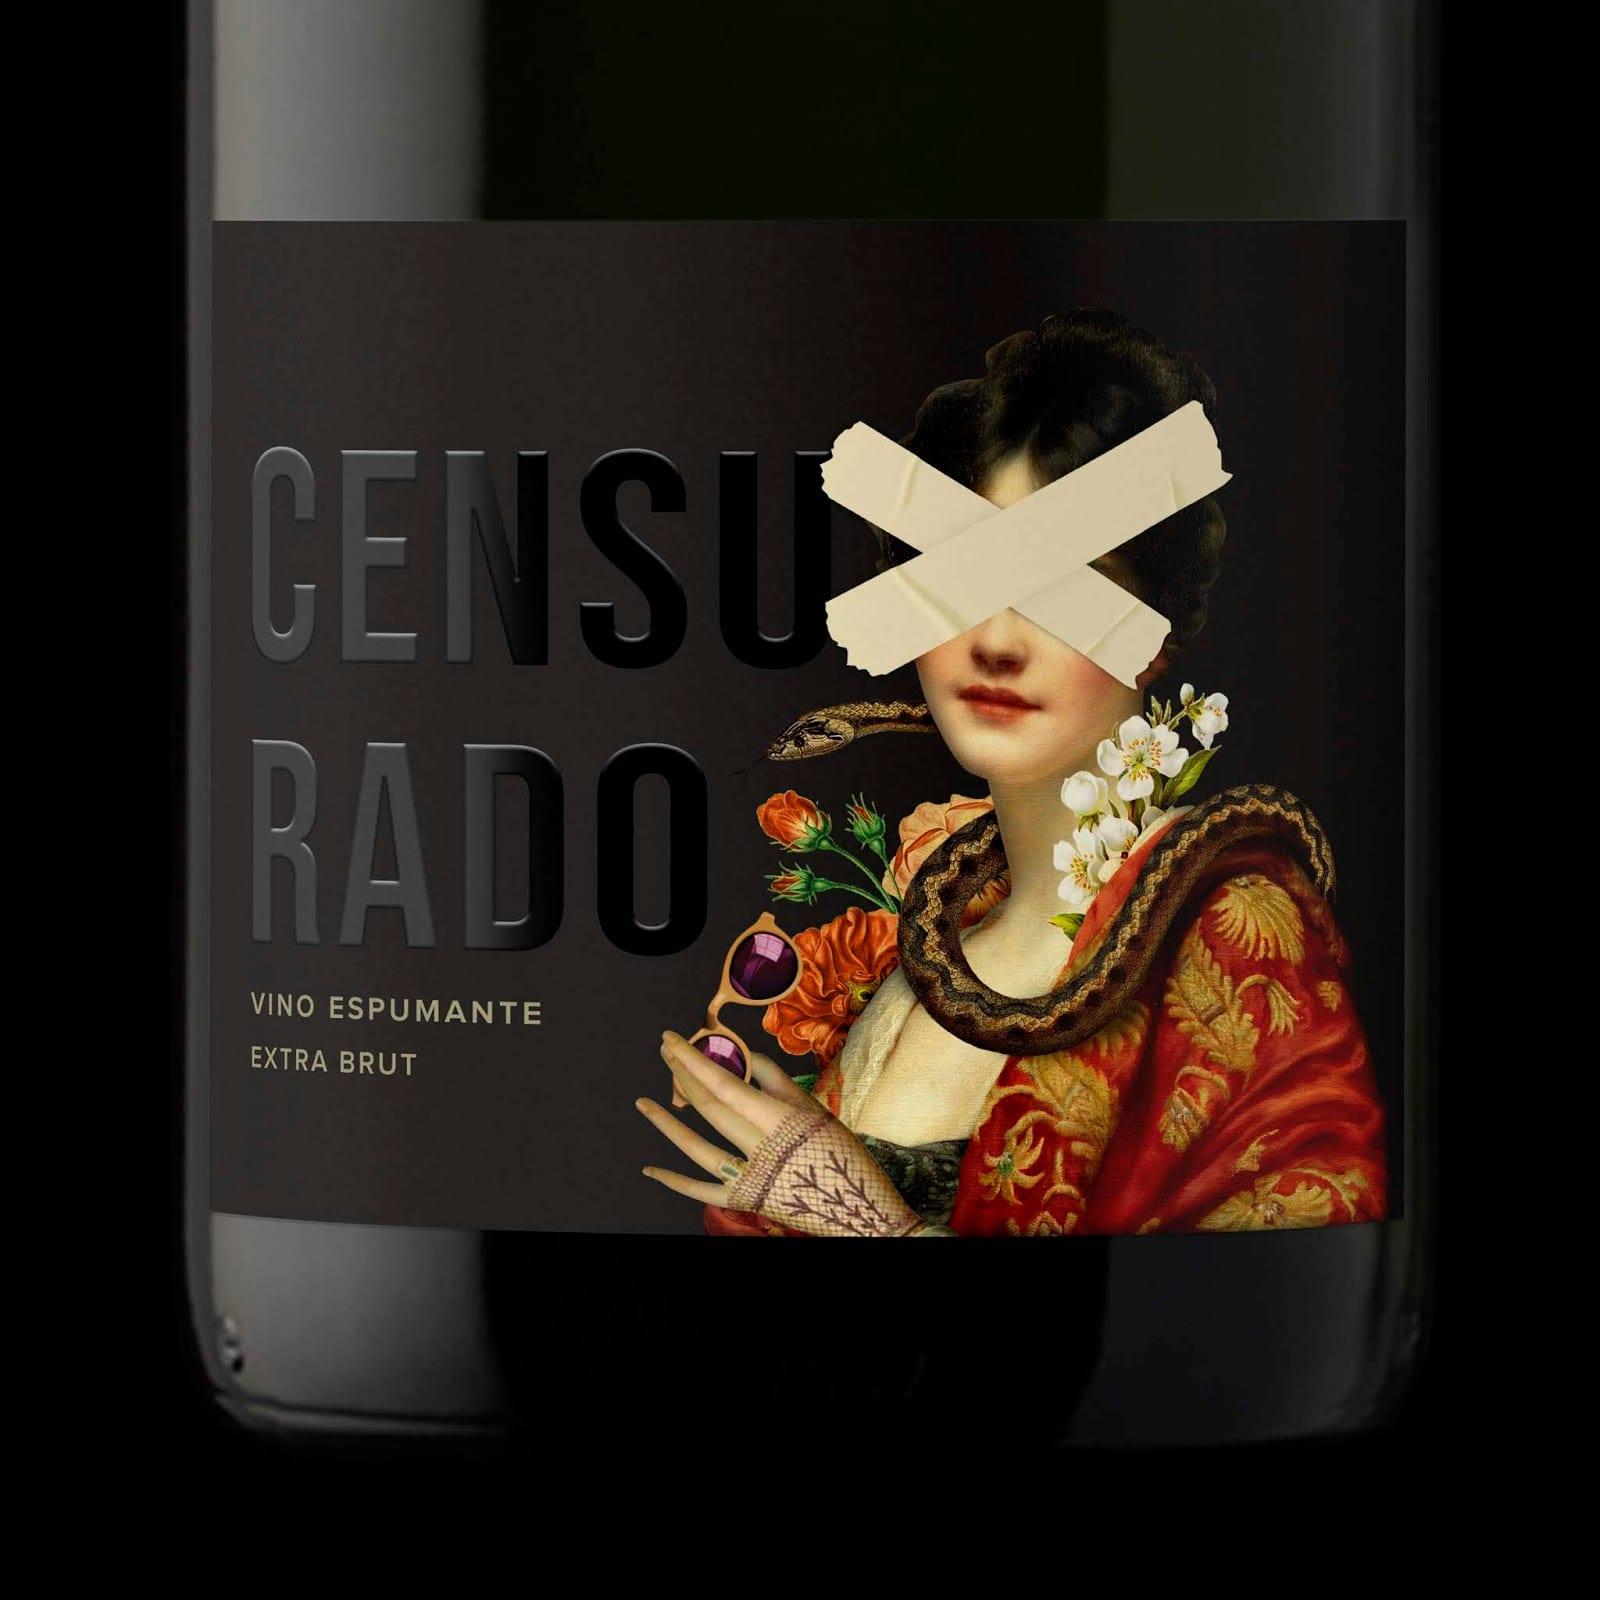 2 censurado big - Ach, tie obaly – Censurado wine